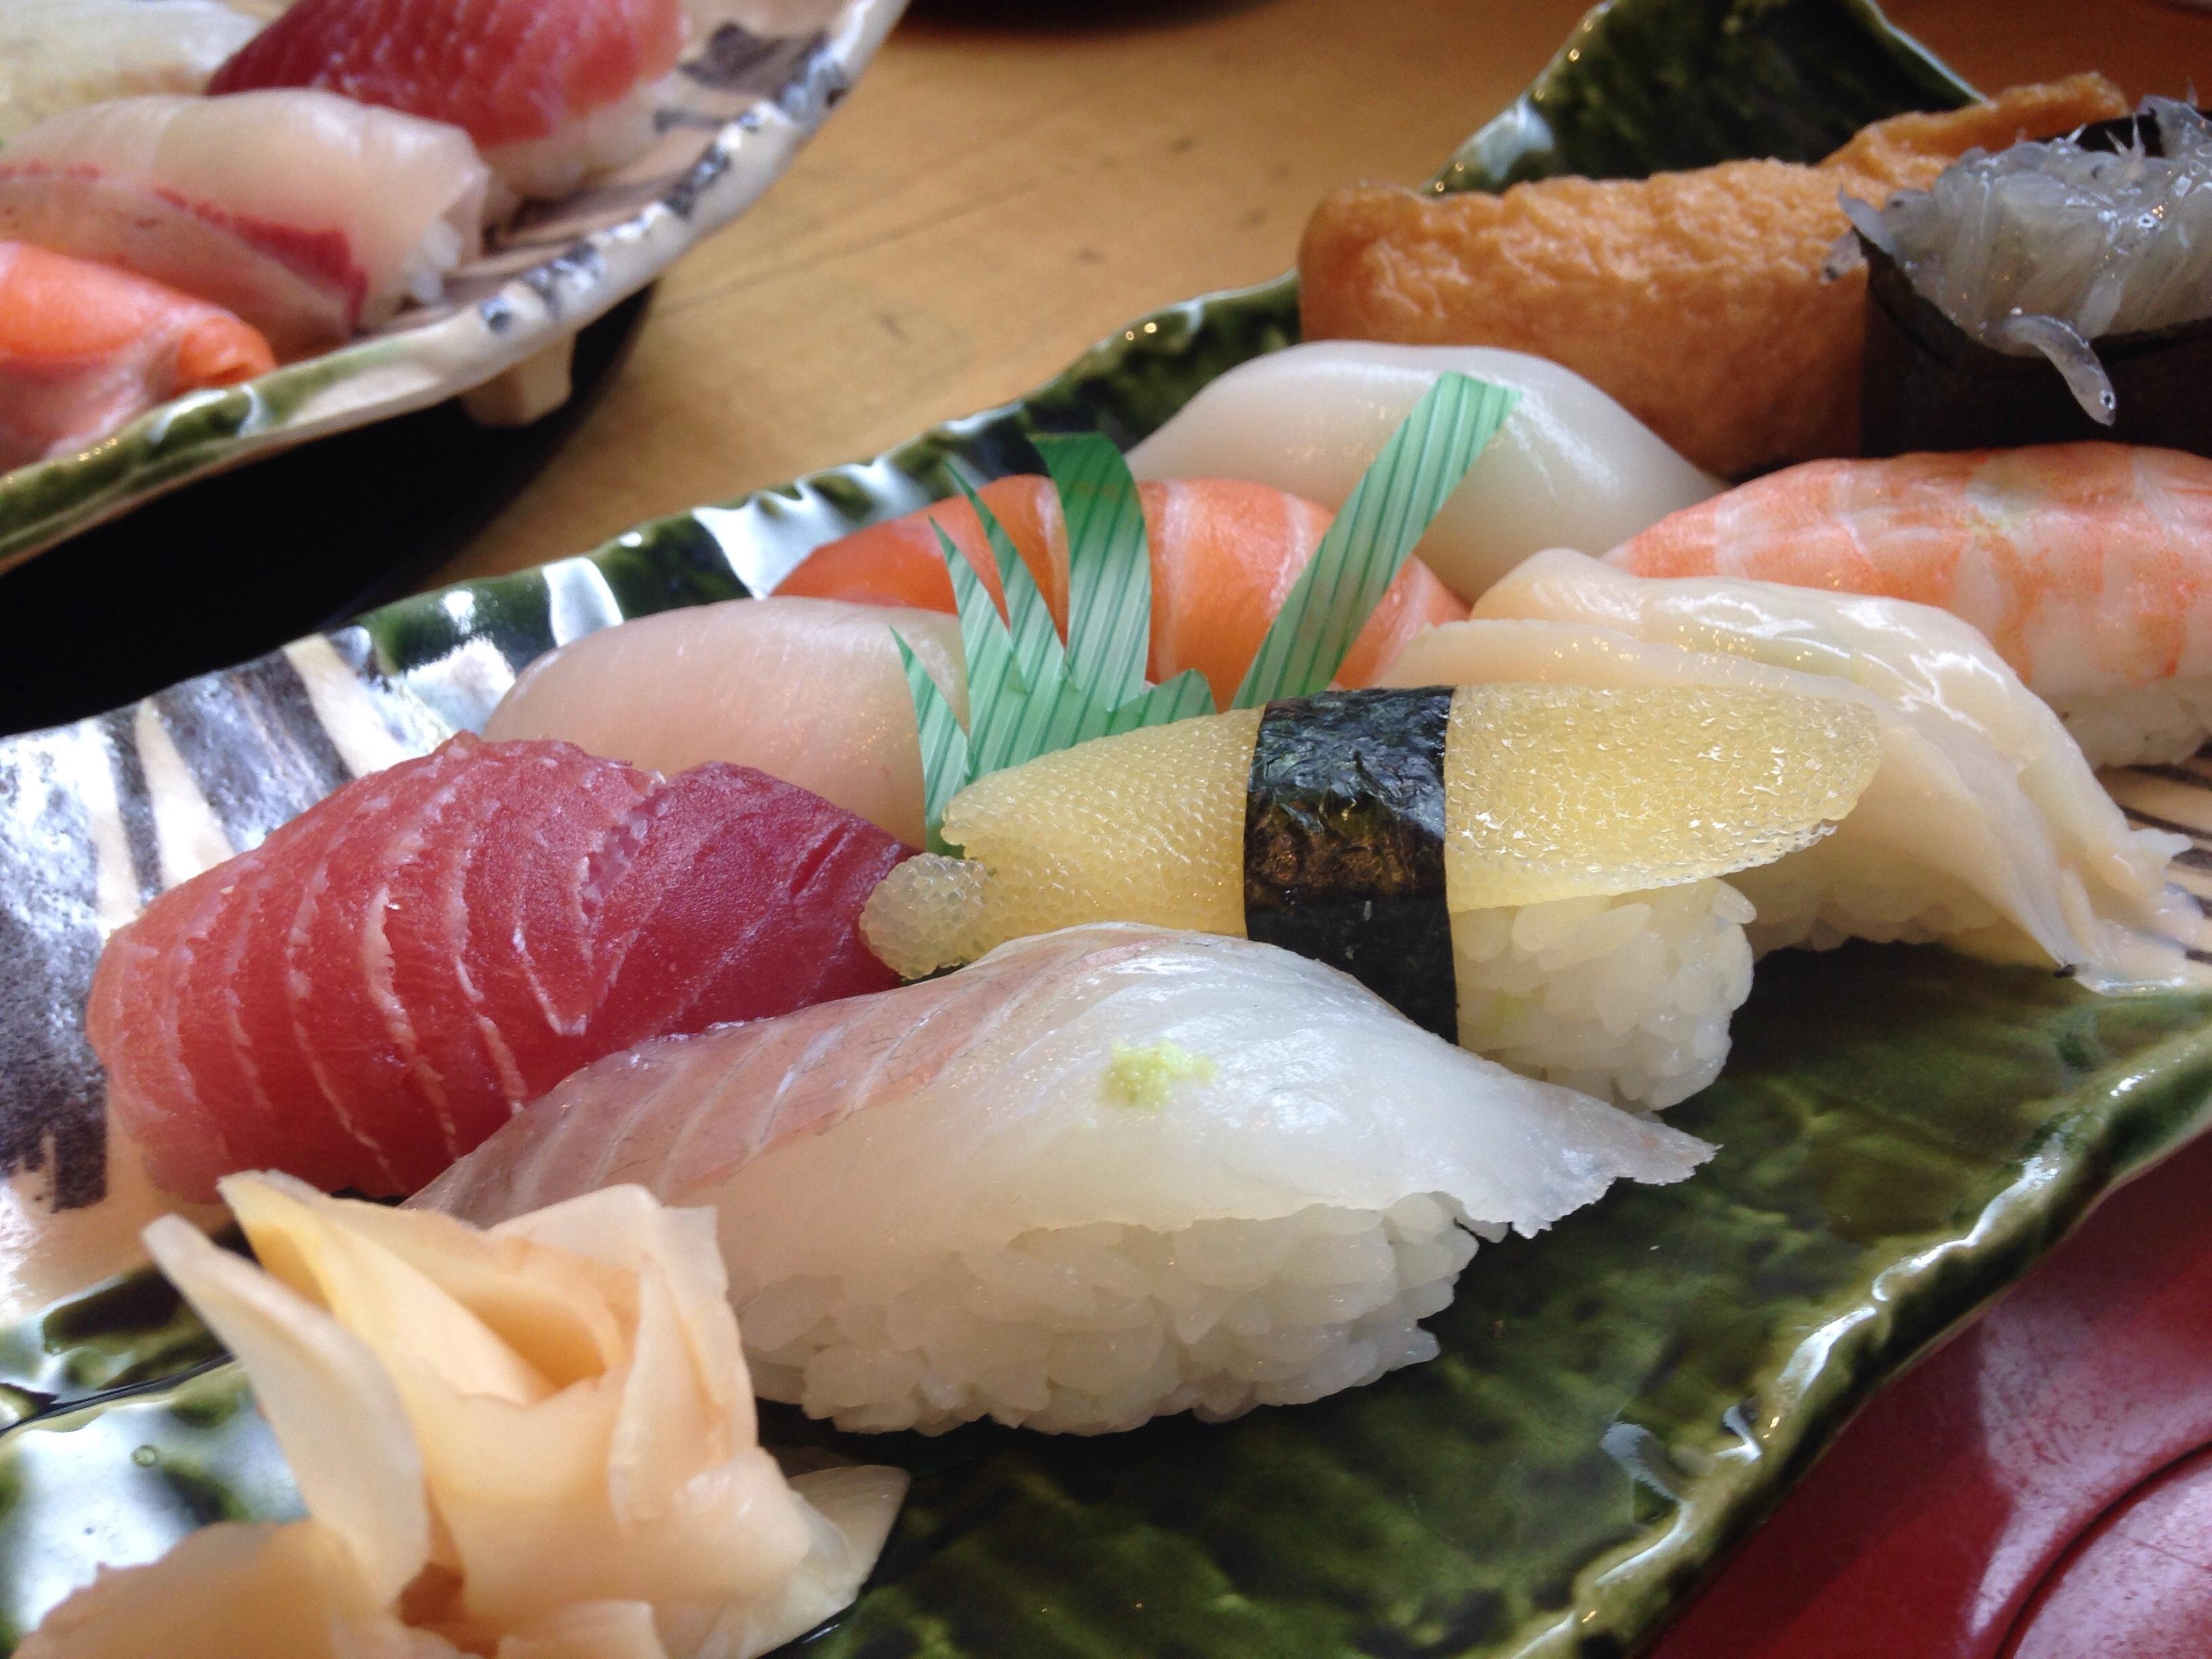 Gambar Makan Makanan Laut Ikan Masakan Makanan Asia Sushi